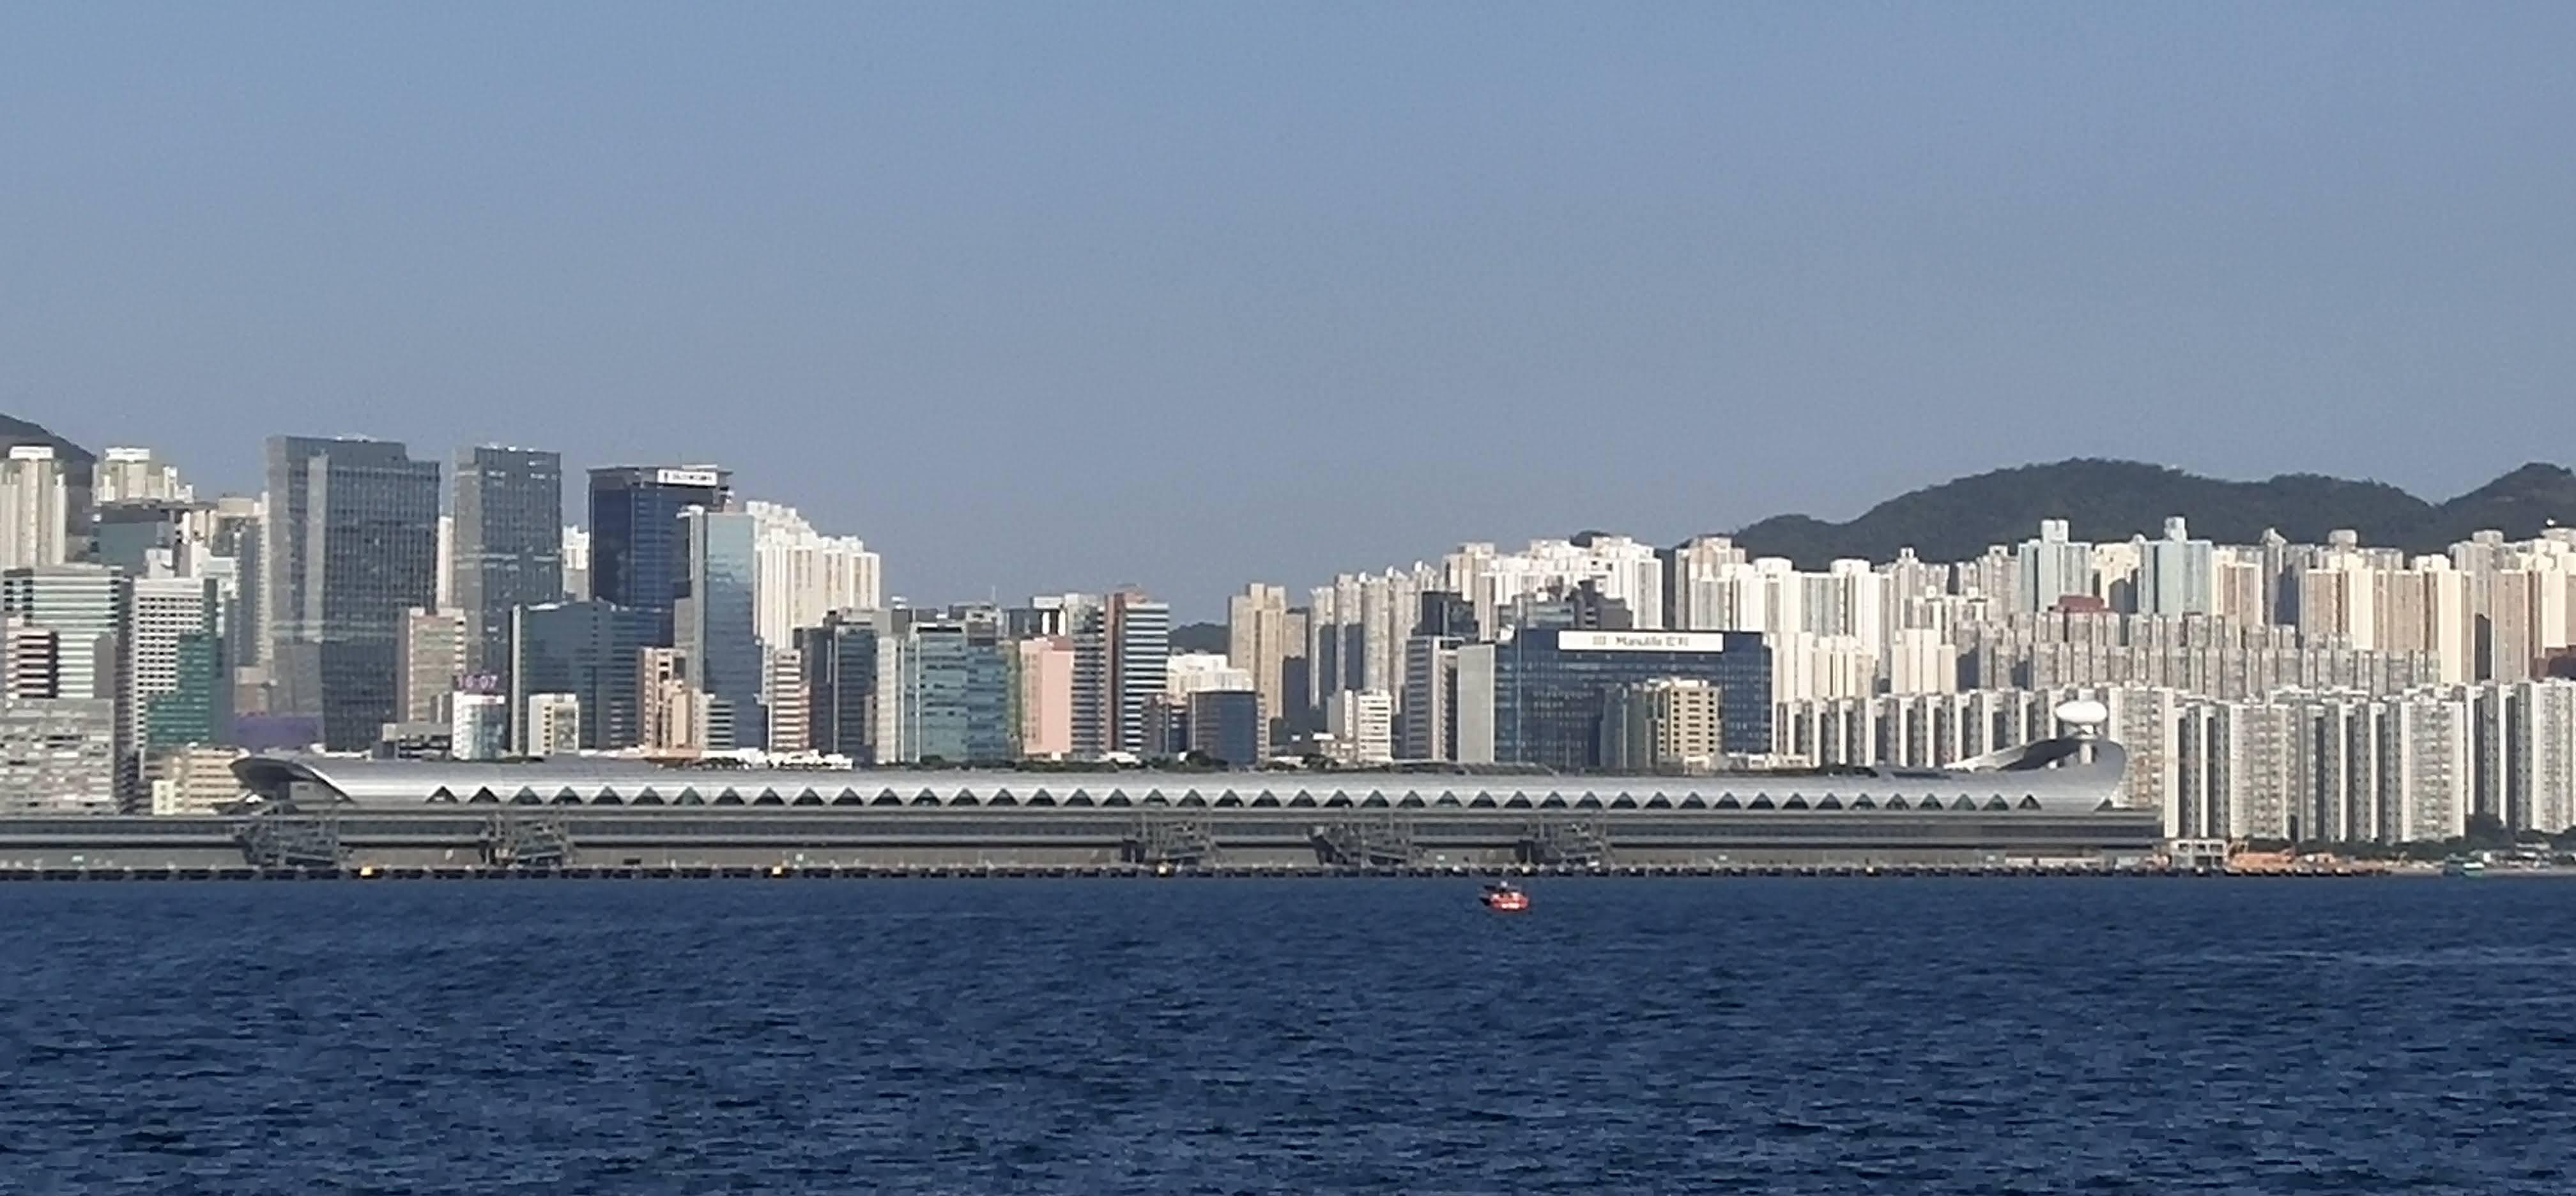 Kai Tak Cruise Terminal is empty under Covid-19.